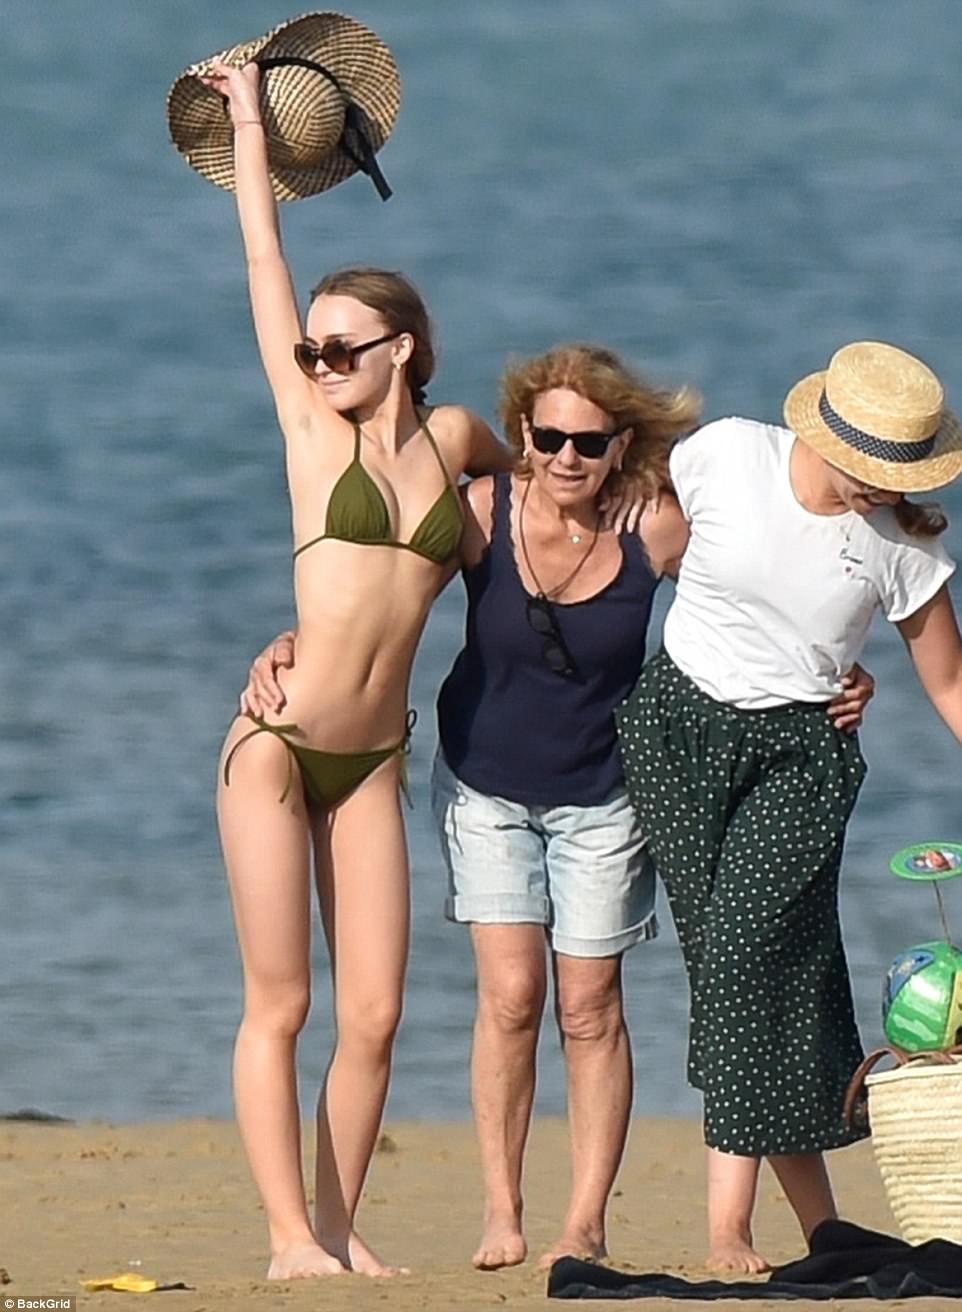 Celebrites Brooke Burns nudes (25 foto and video), Topless, Leaked, Feet, bra 2015